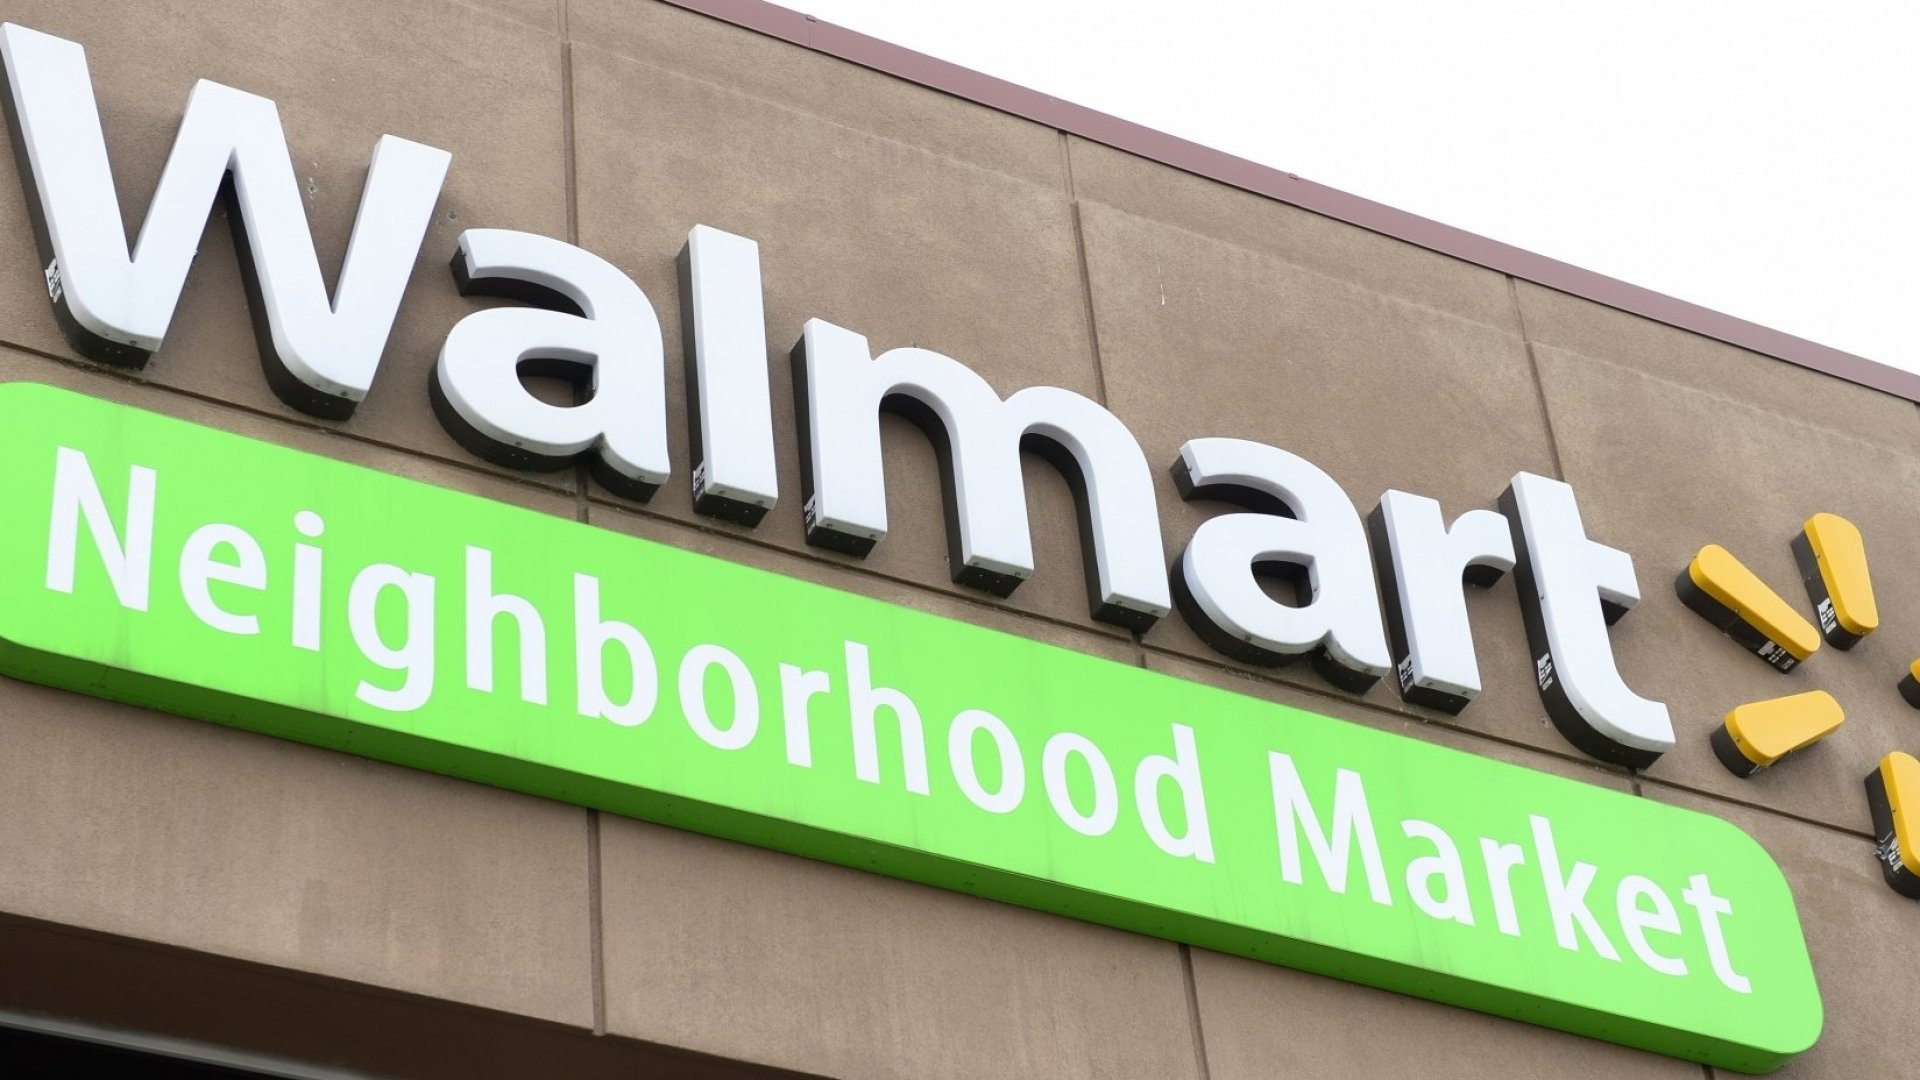 Walmart Is Jumping on the Gig Economy Bandwagon